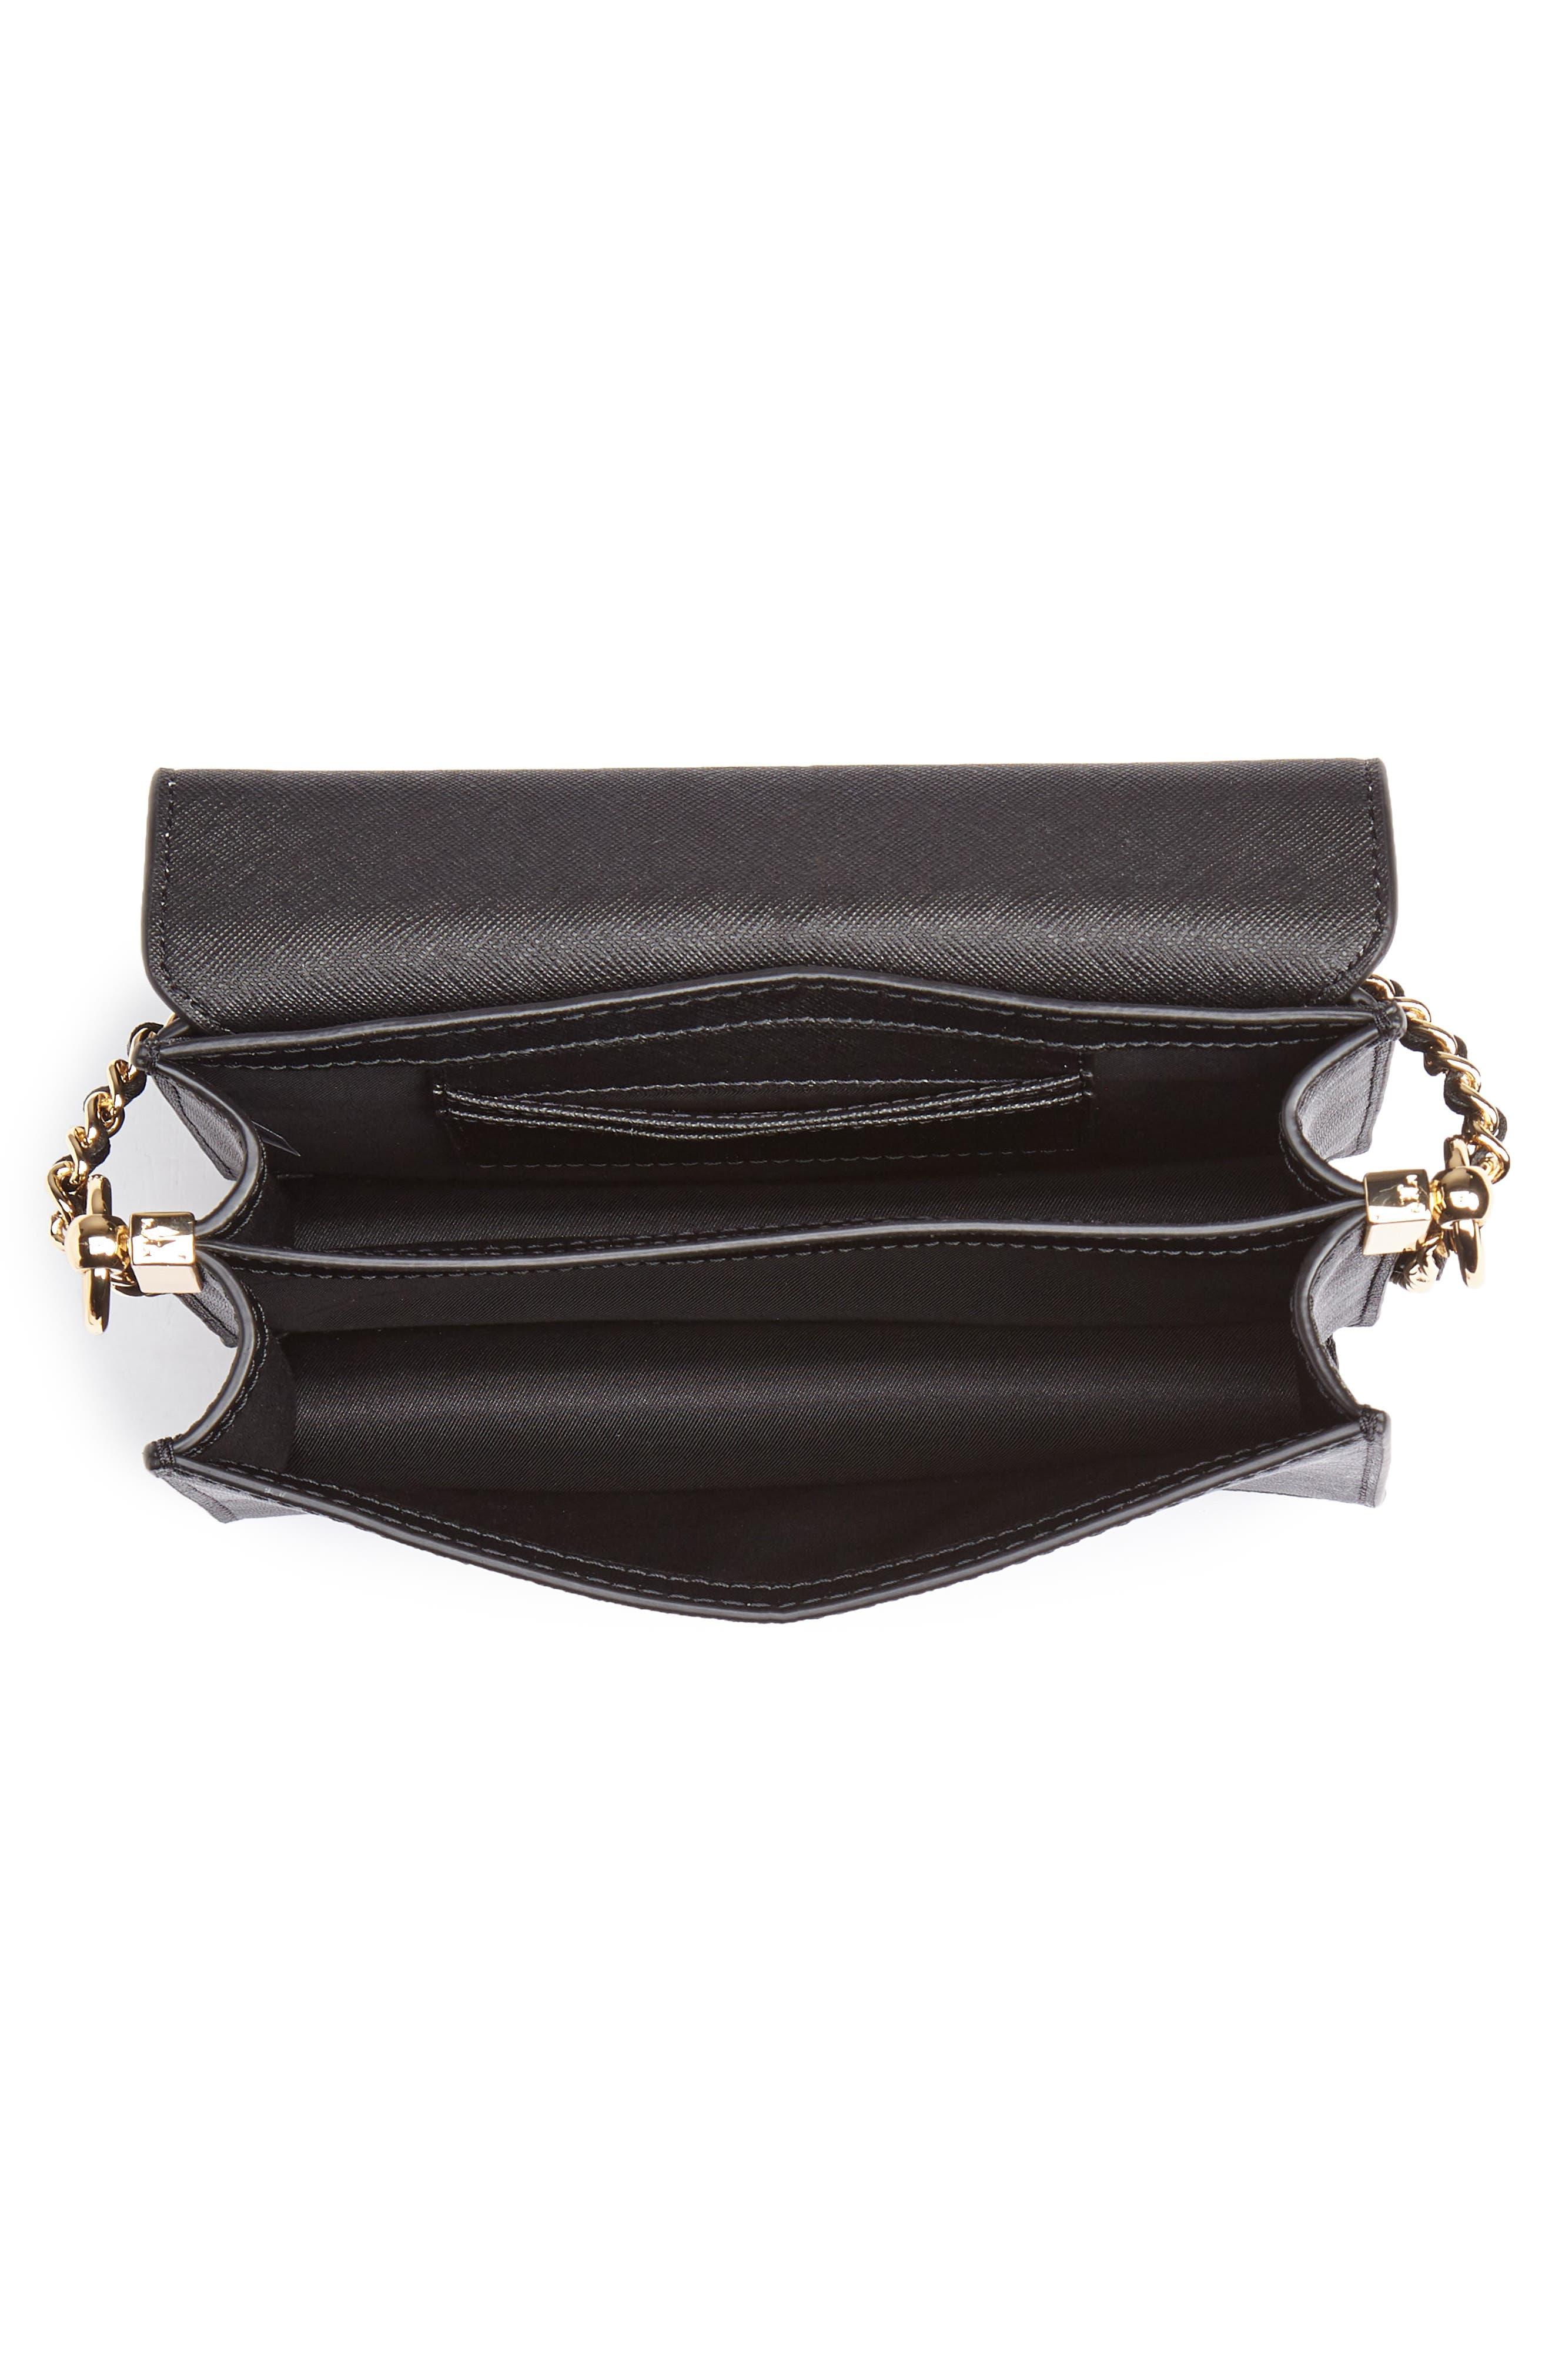 Mini Robinson Convertible Leather Shoulder Bag,                             Alternate thumbnail 4, color,                             BLACK